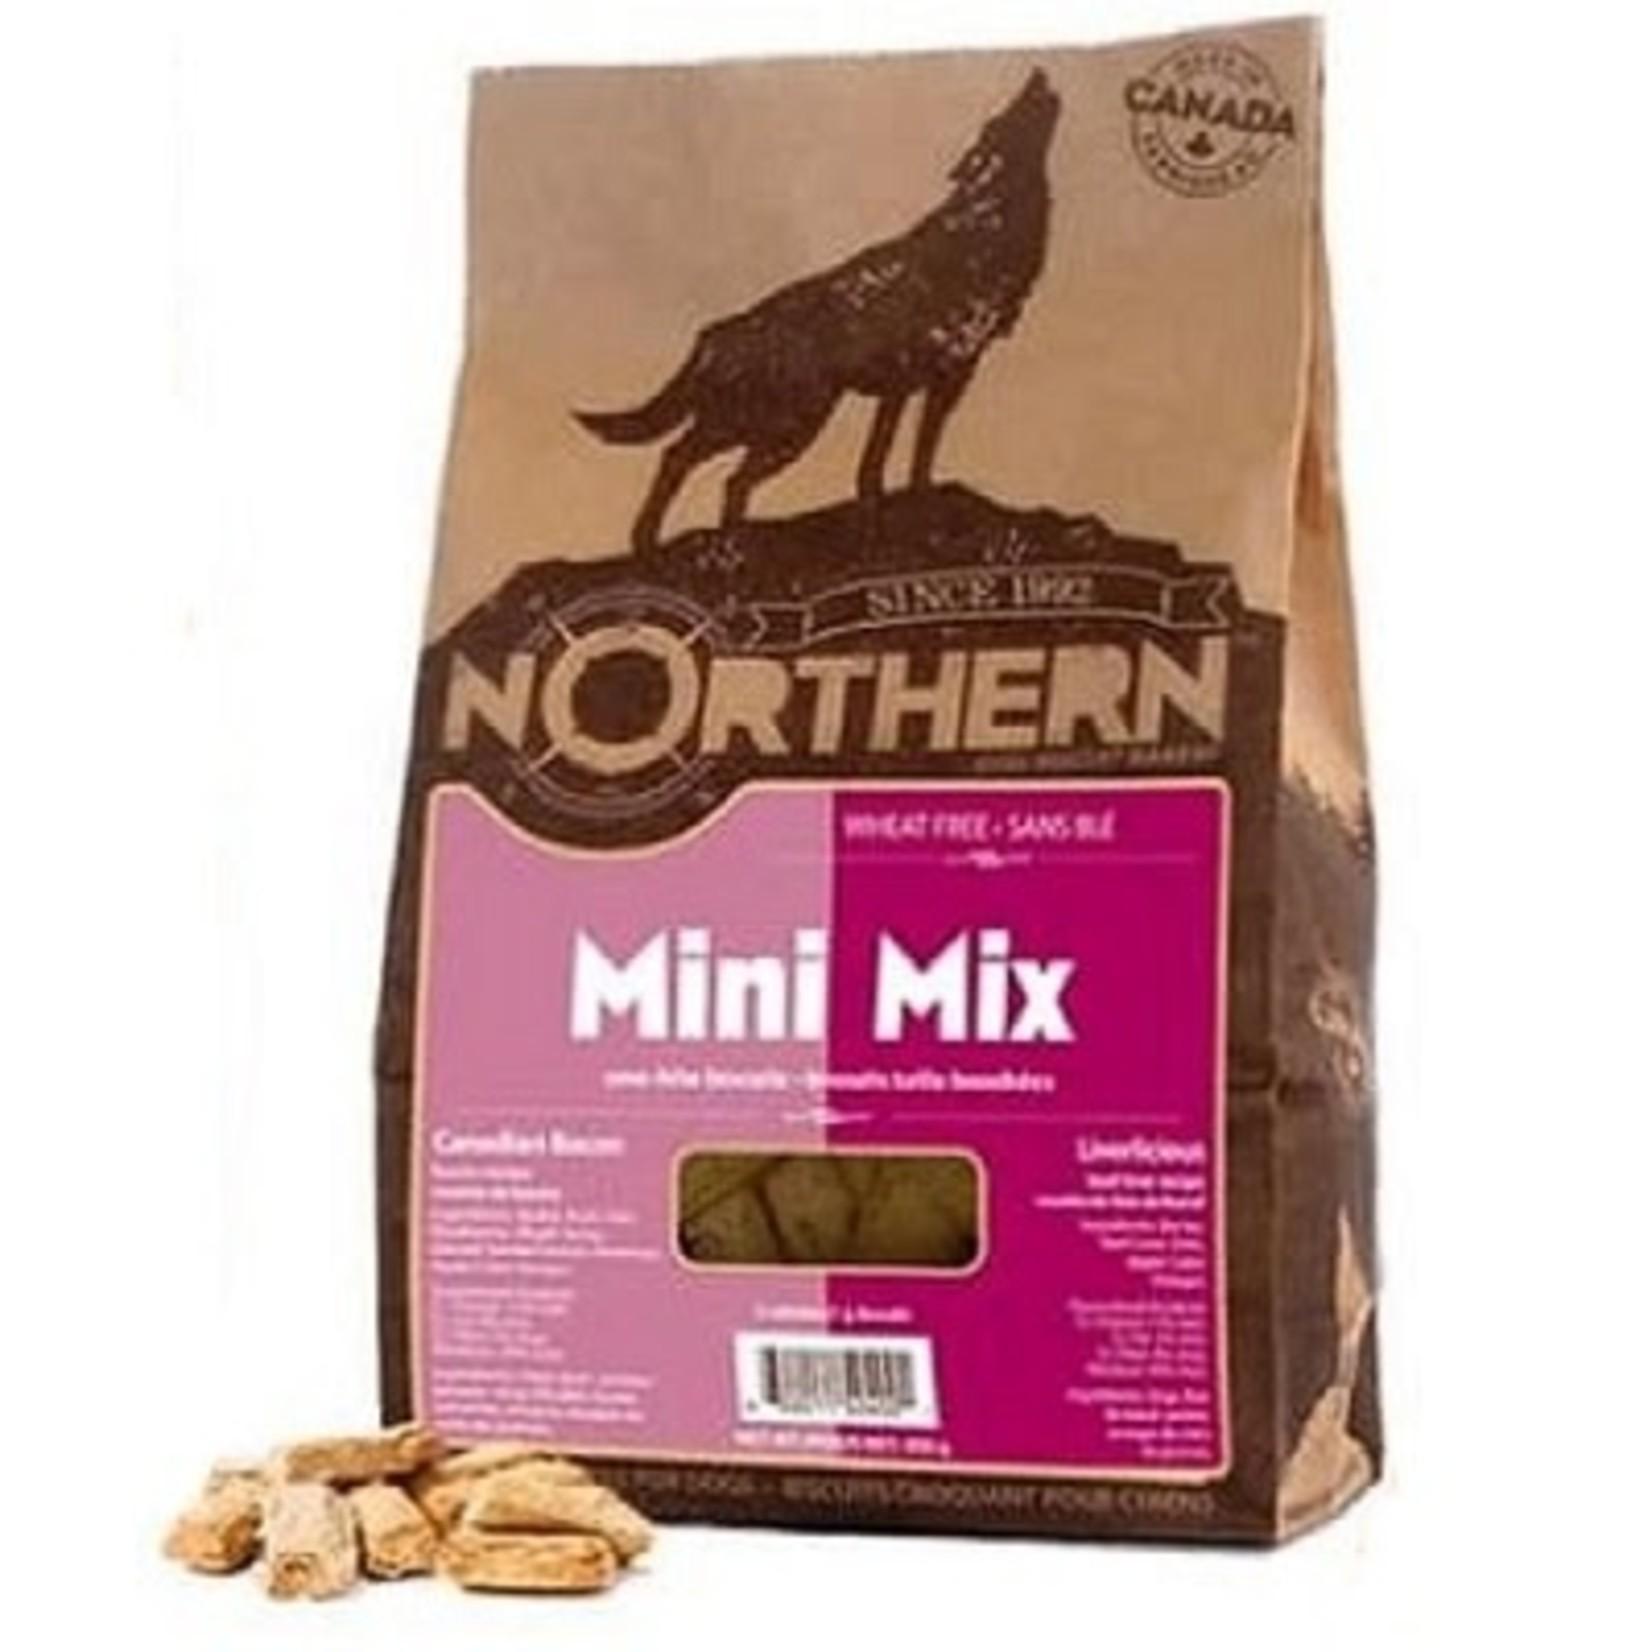 Northern biscuit mini mix Liverlicious 450g